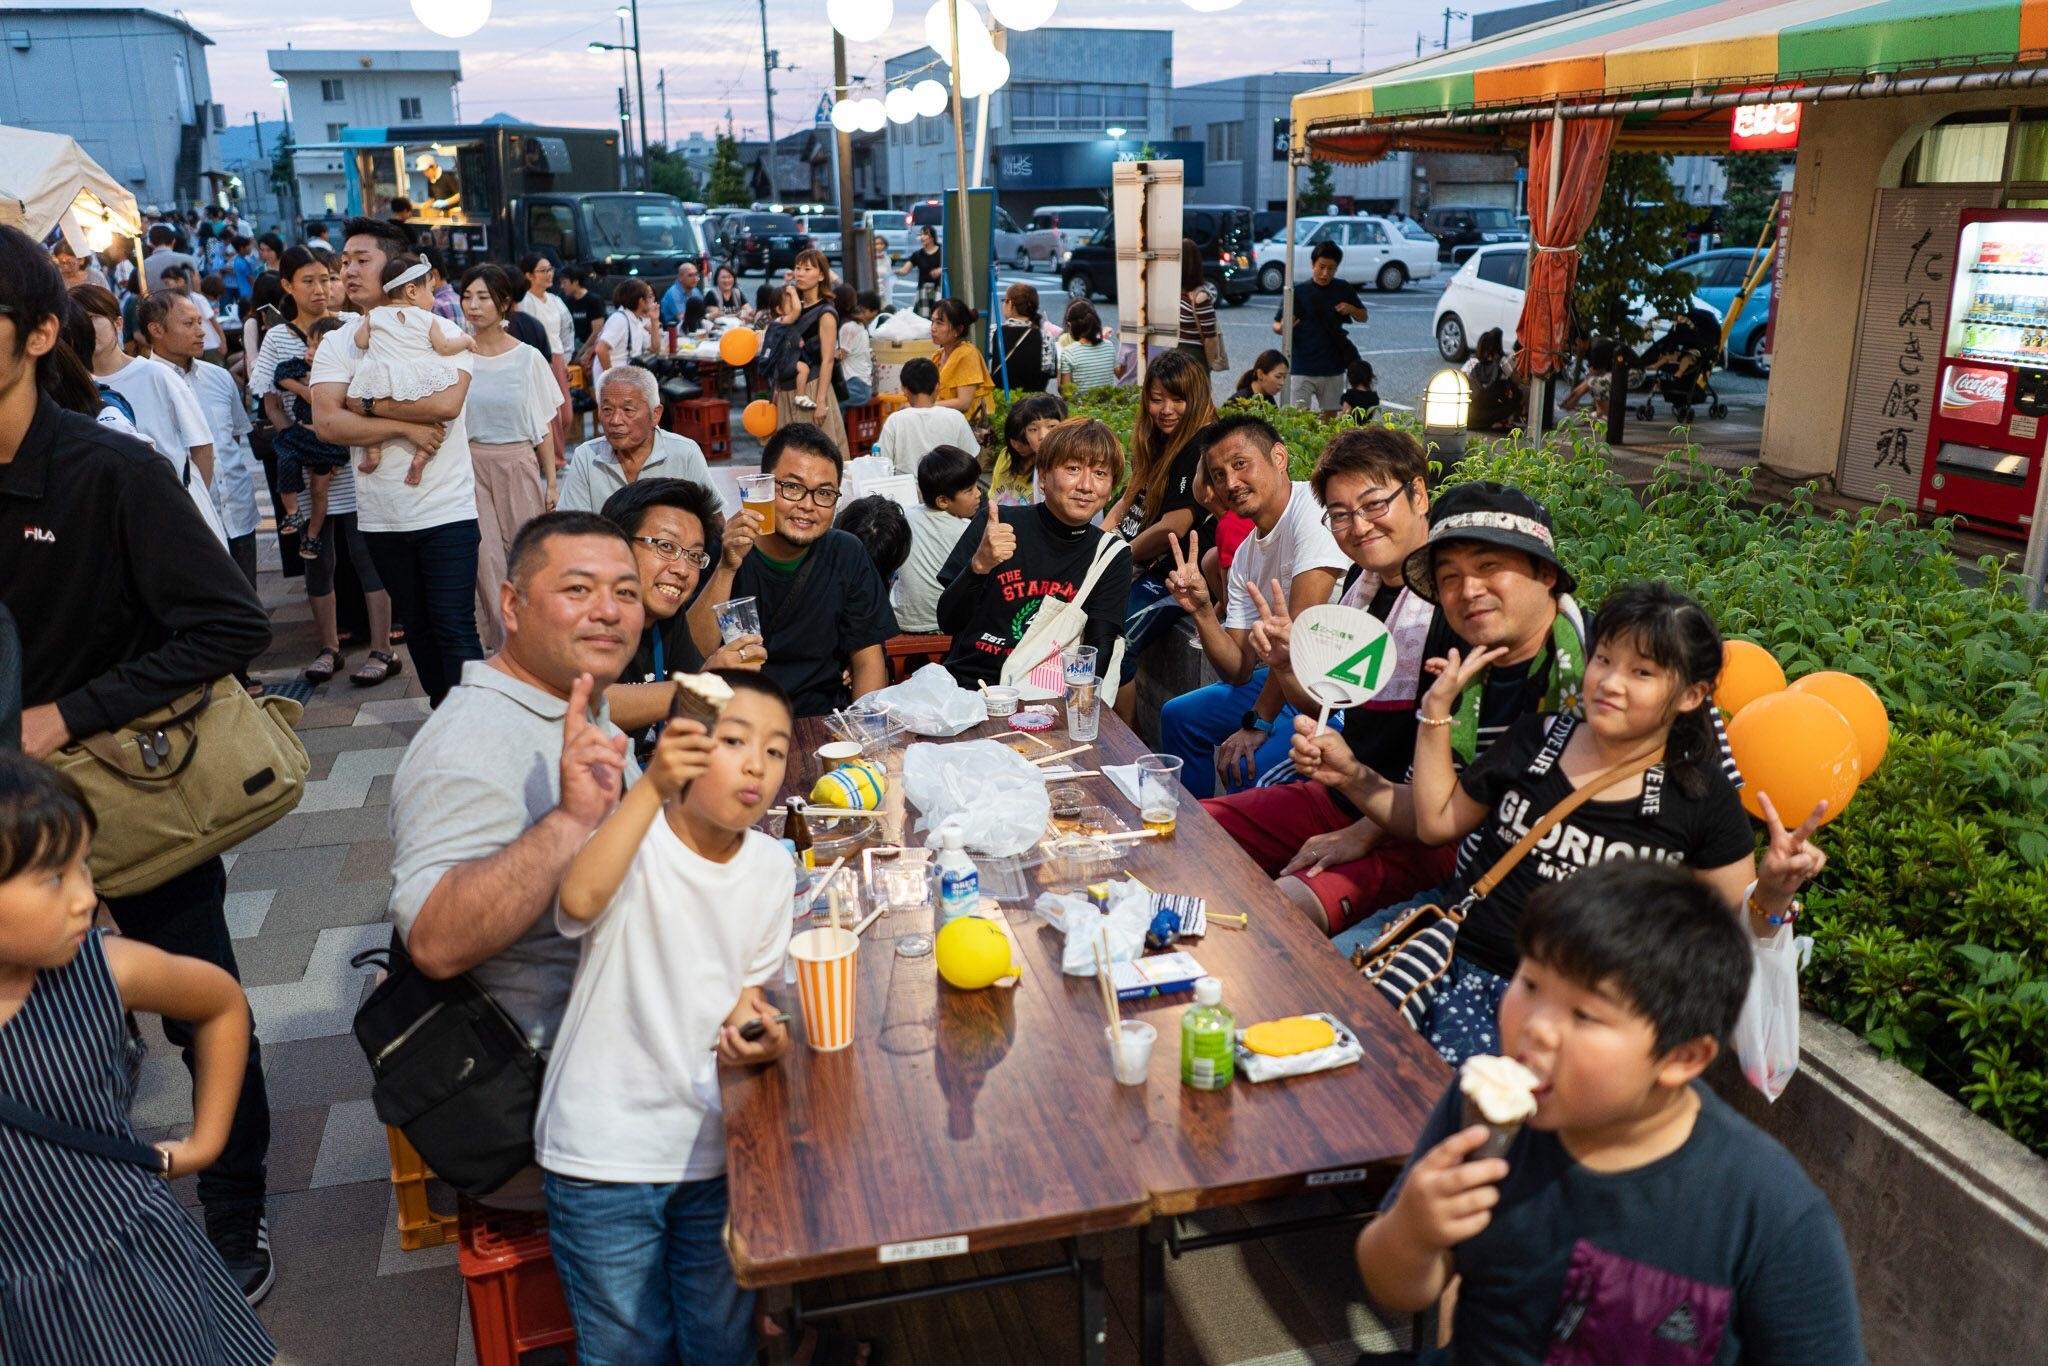 f:id:masanori-kato1972:20190826191101j:image